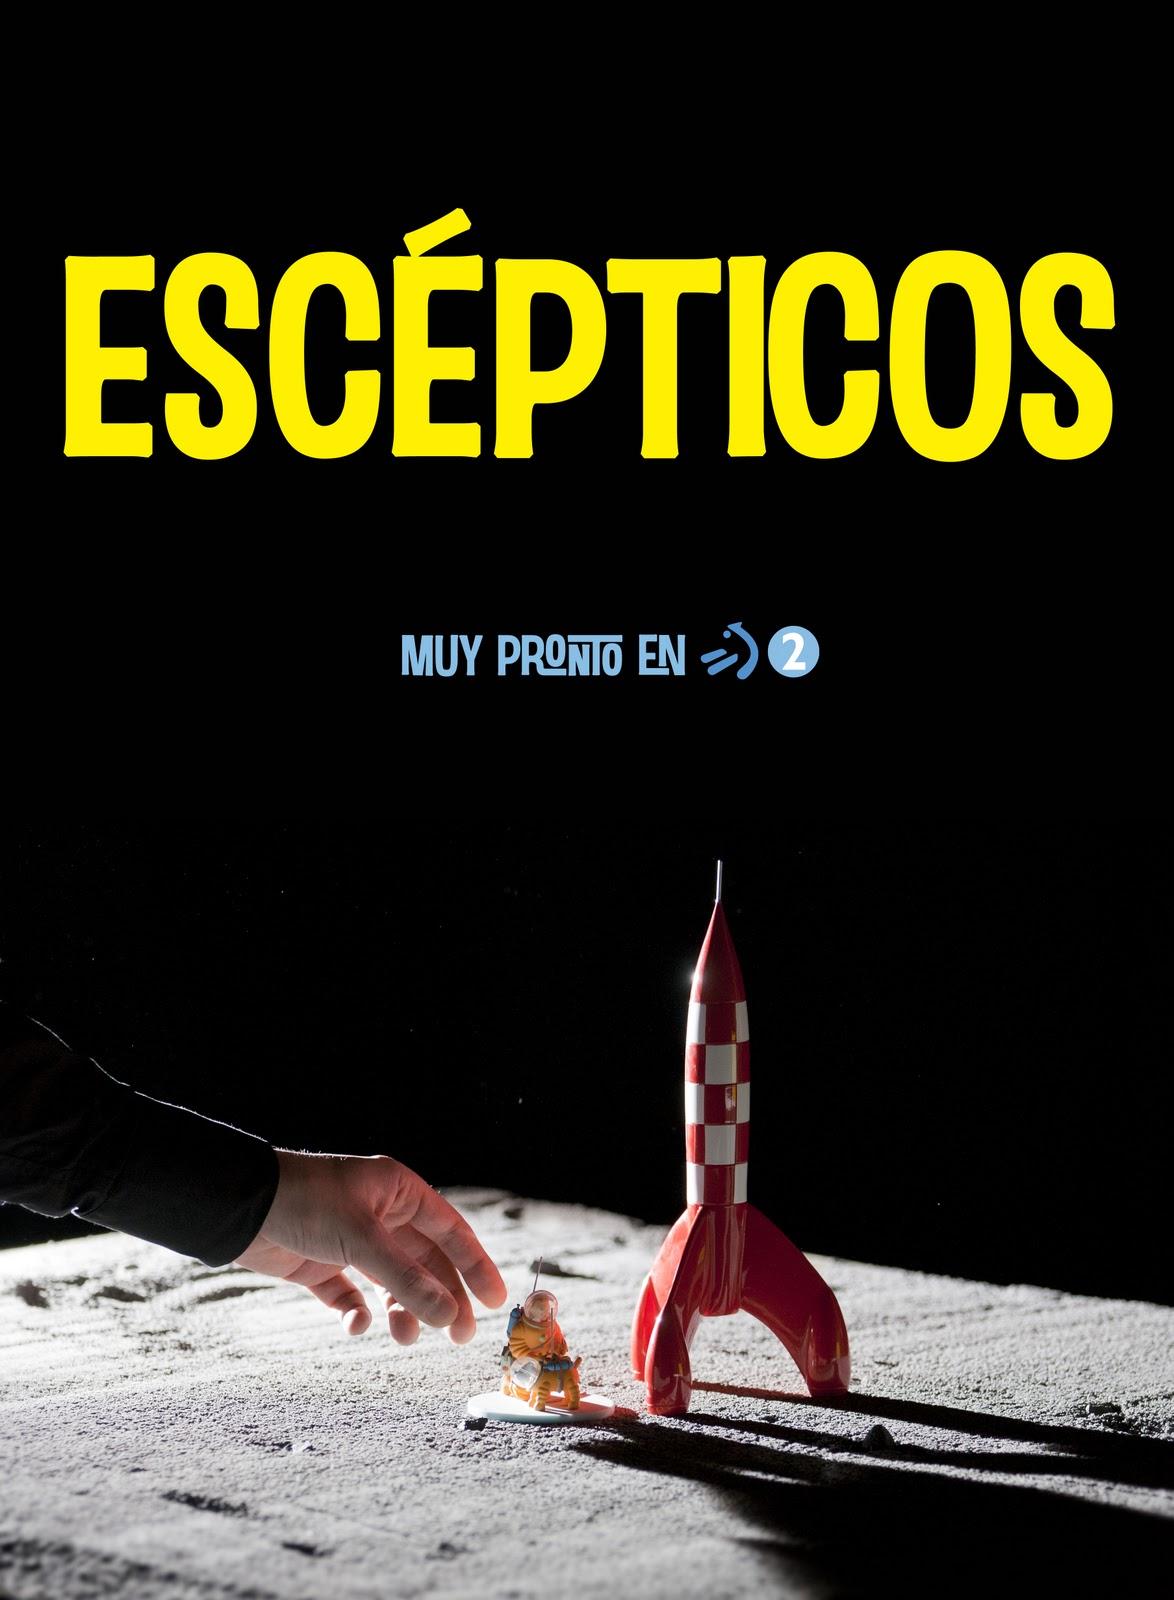 Imagen promocional de Escépticos